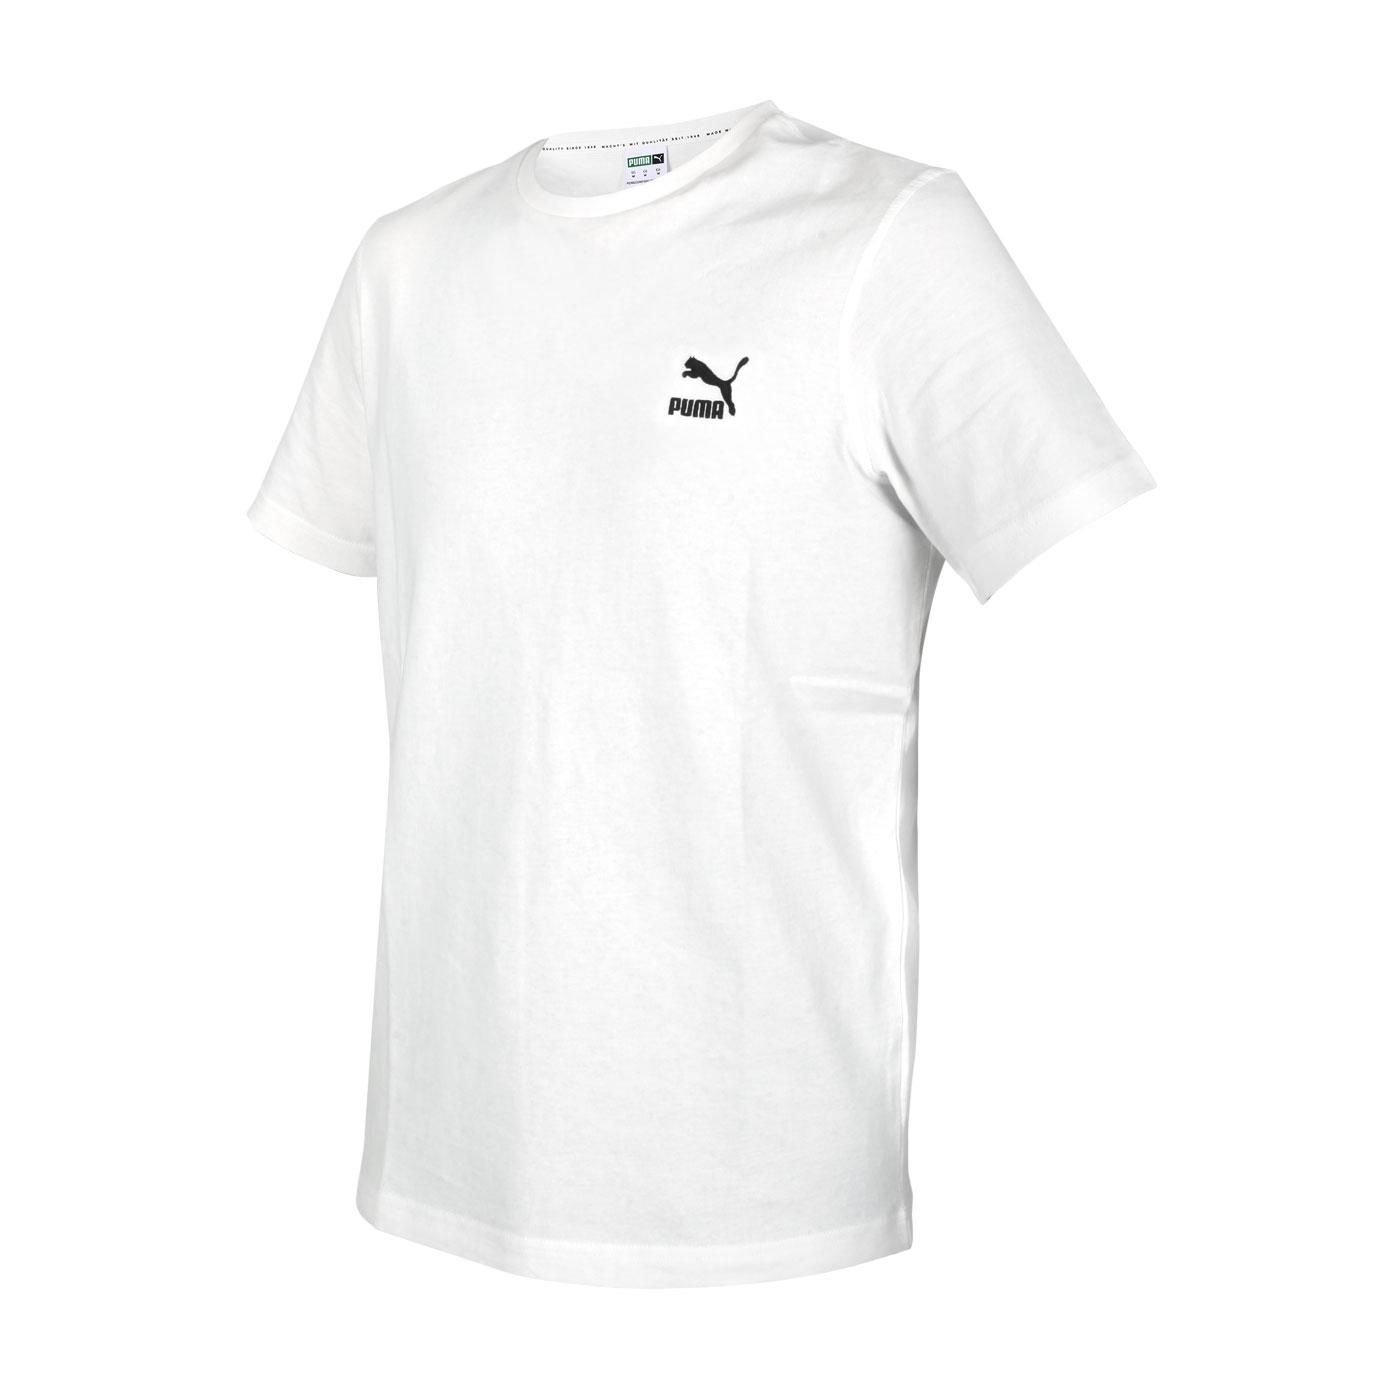 PUMA 男款刺繡短袖T恤 59979502 - 白黑